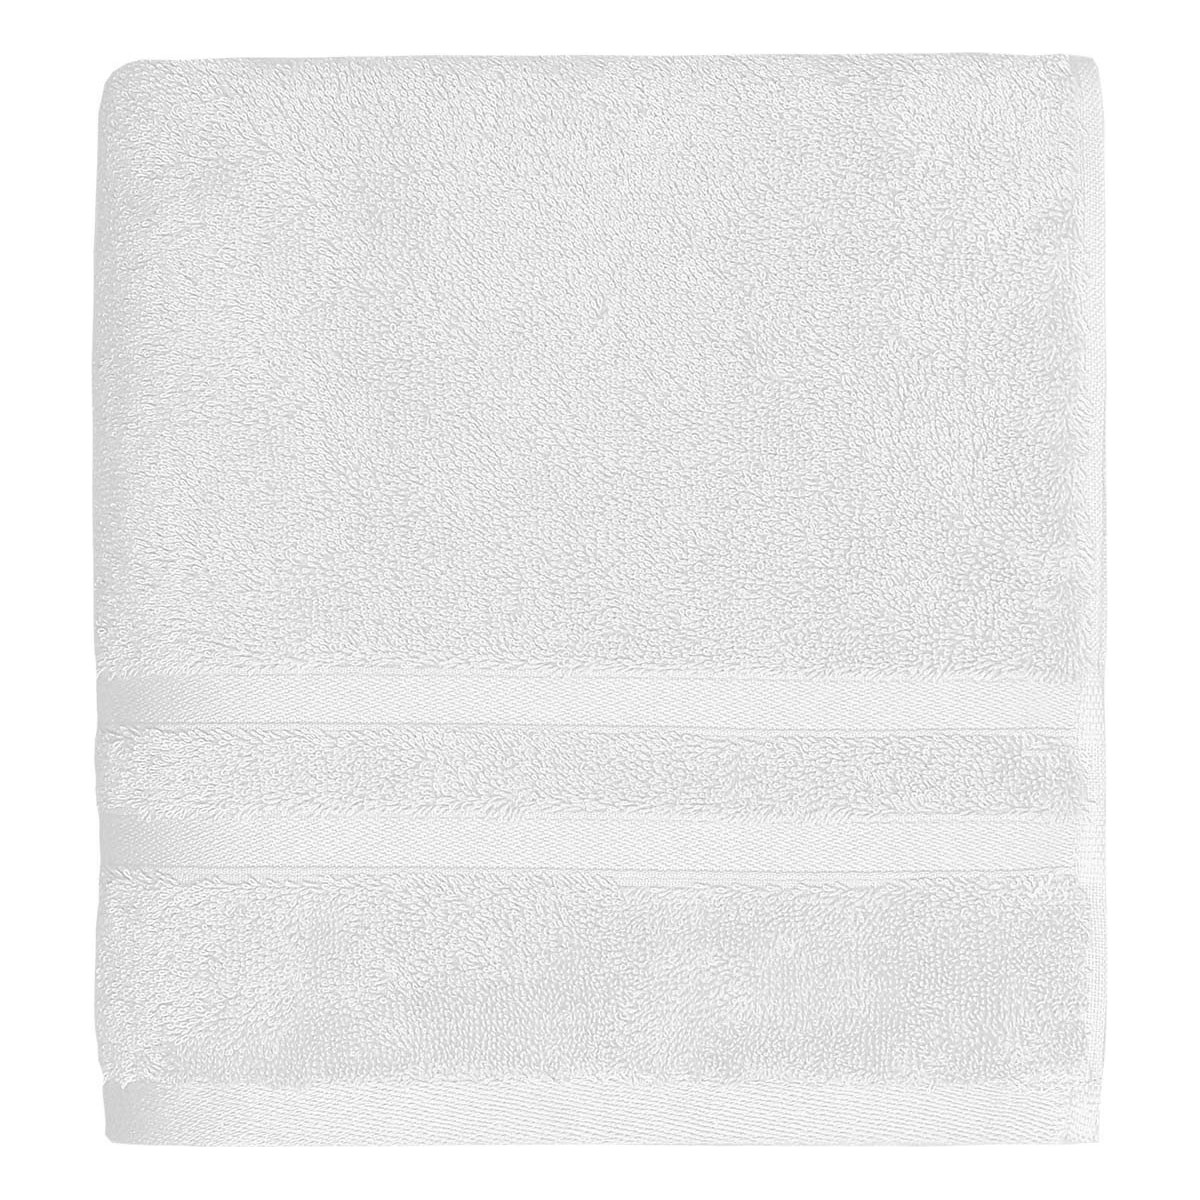 Drap de bain 600gr/m² Blanc 70x140 cm